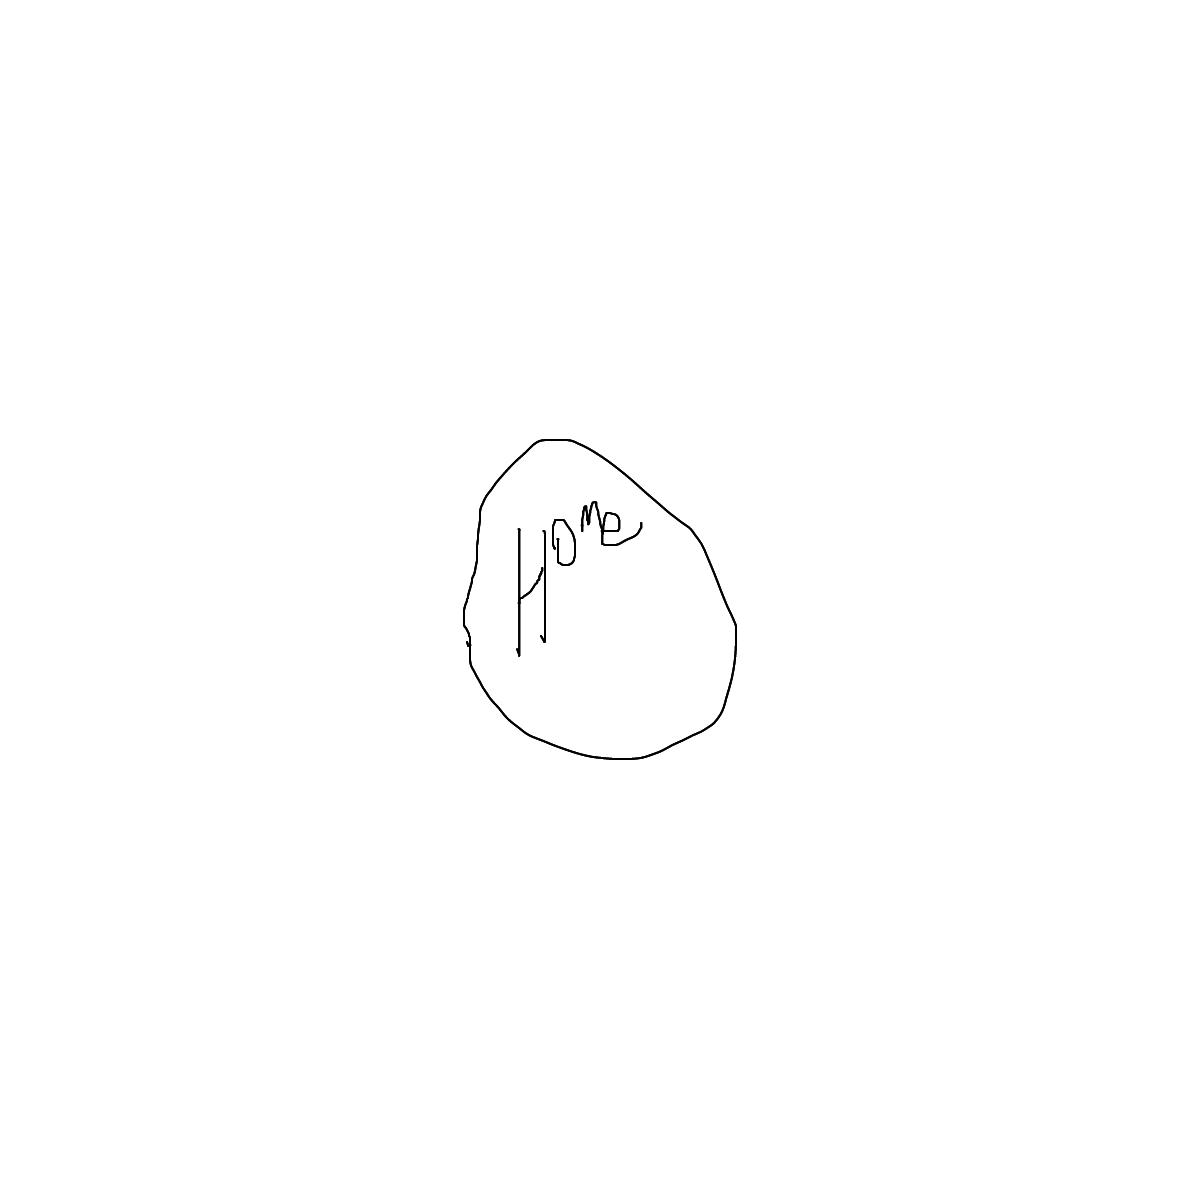 BAAAM drawing#8191 lat:41.1941337585449200lng: -73.2242507934570300